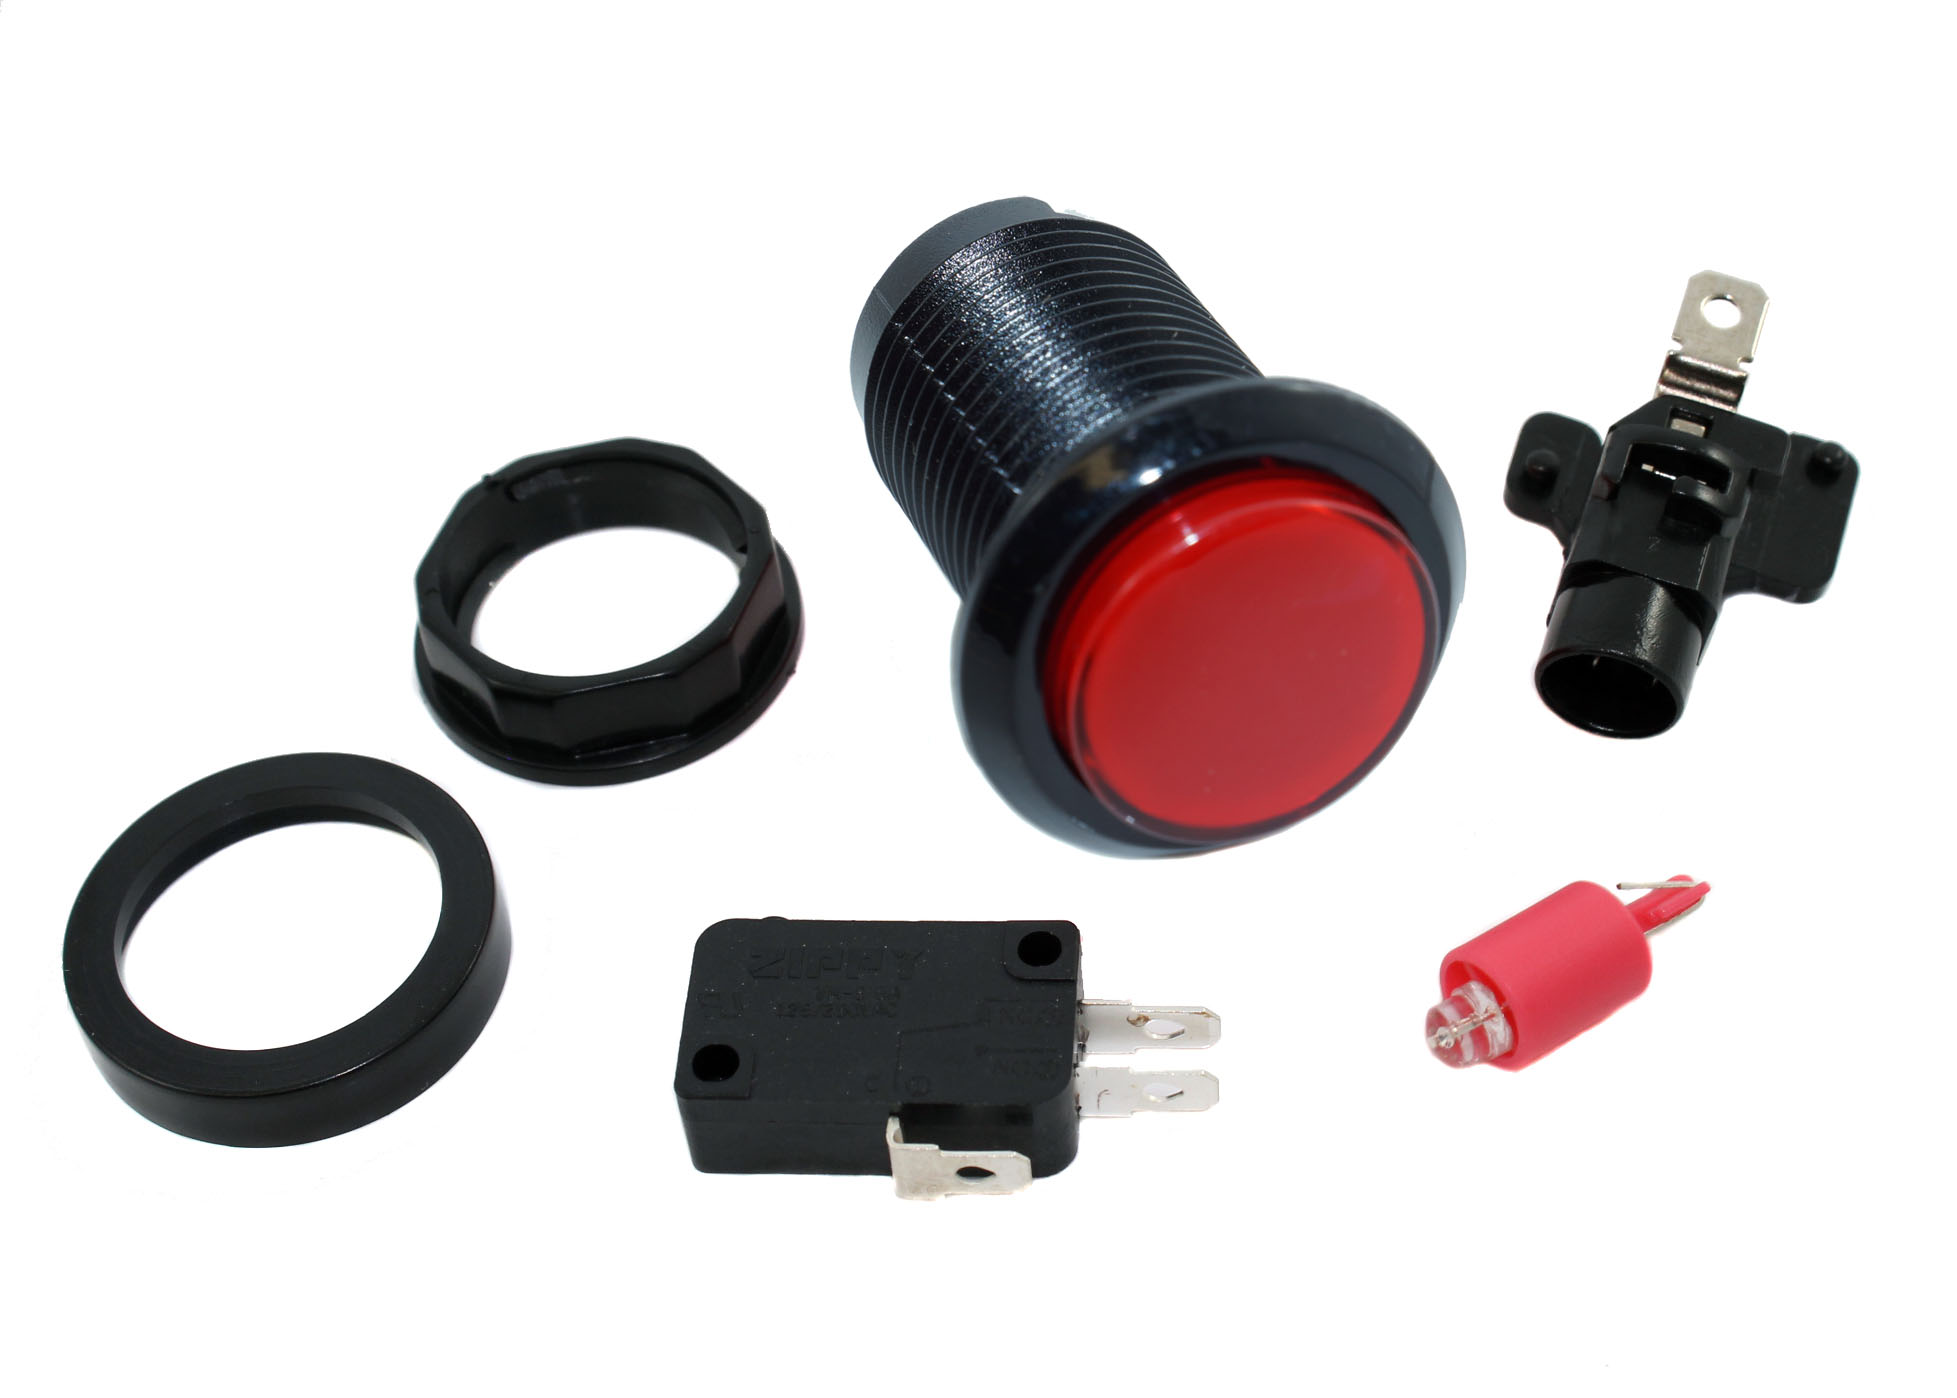 Red LED Pushbutton - Black Bezel